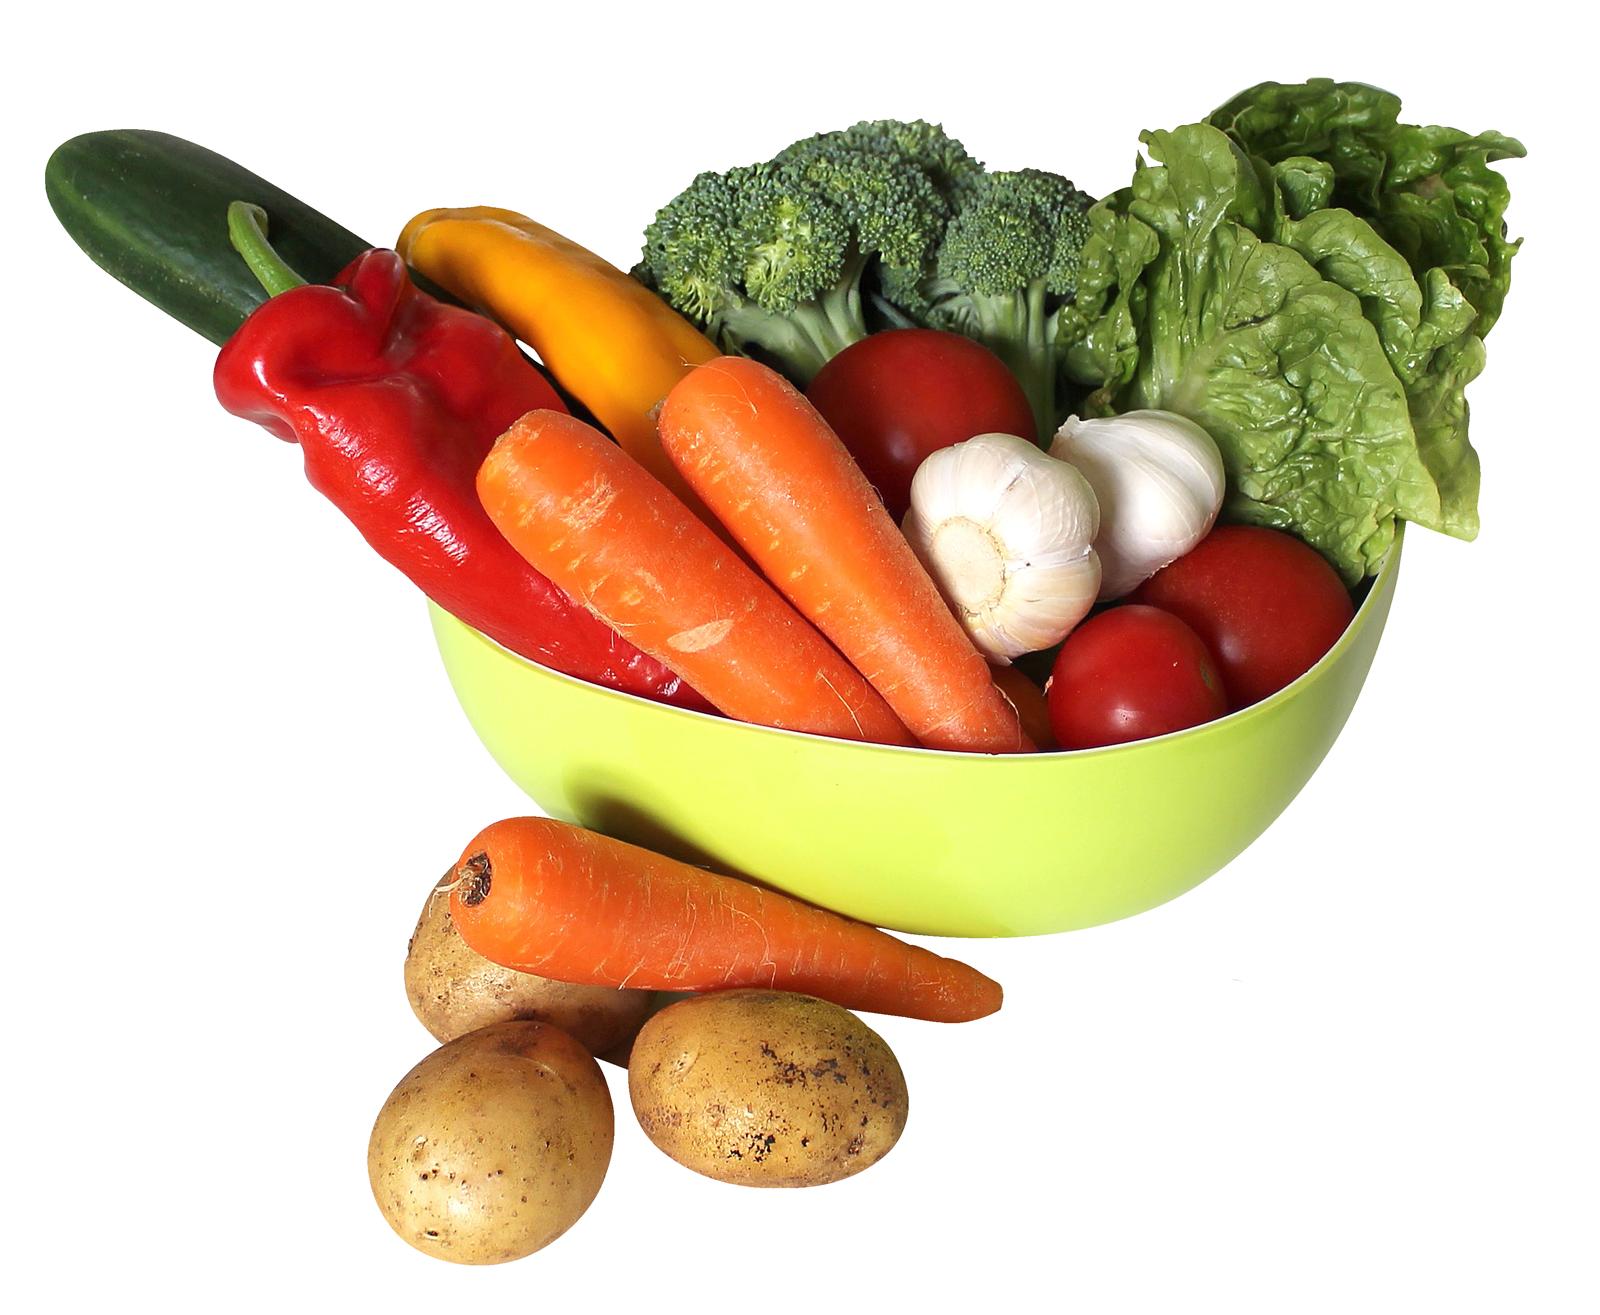 Vegetables PNG Image - PurePNG | Free transparent CC0 PNG ...